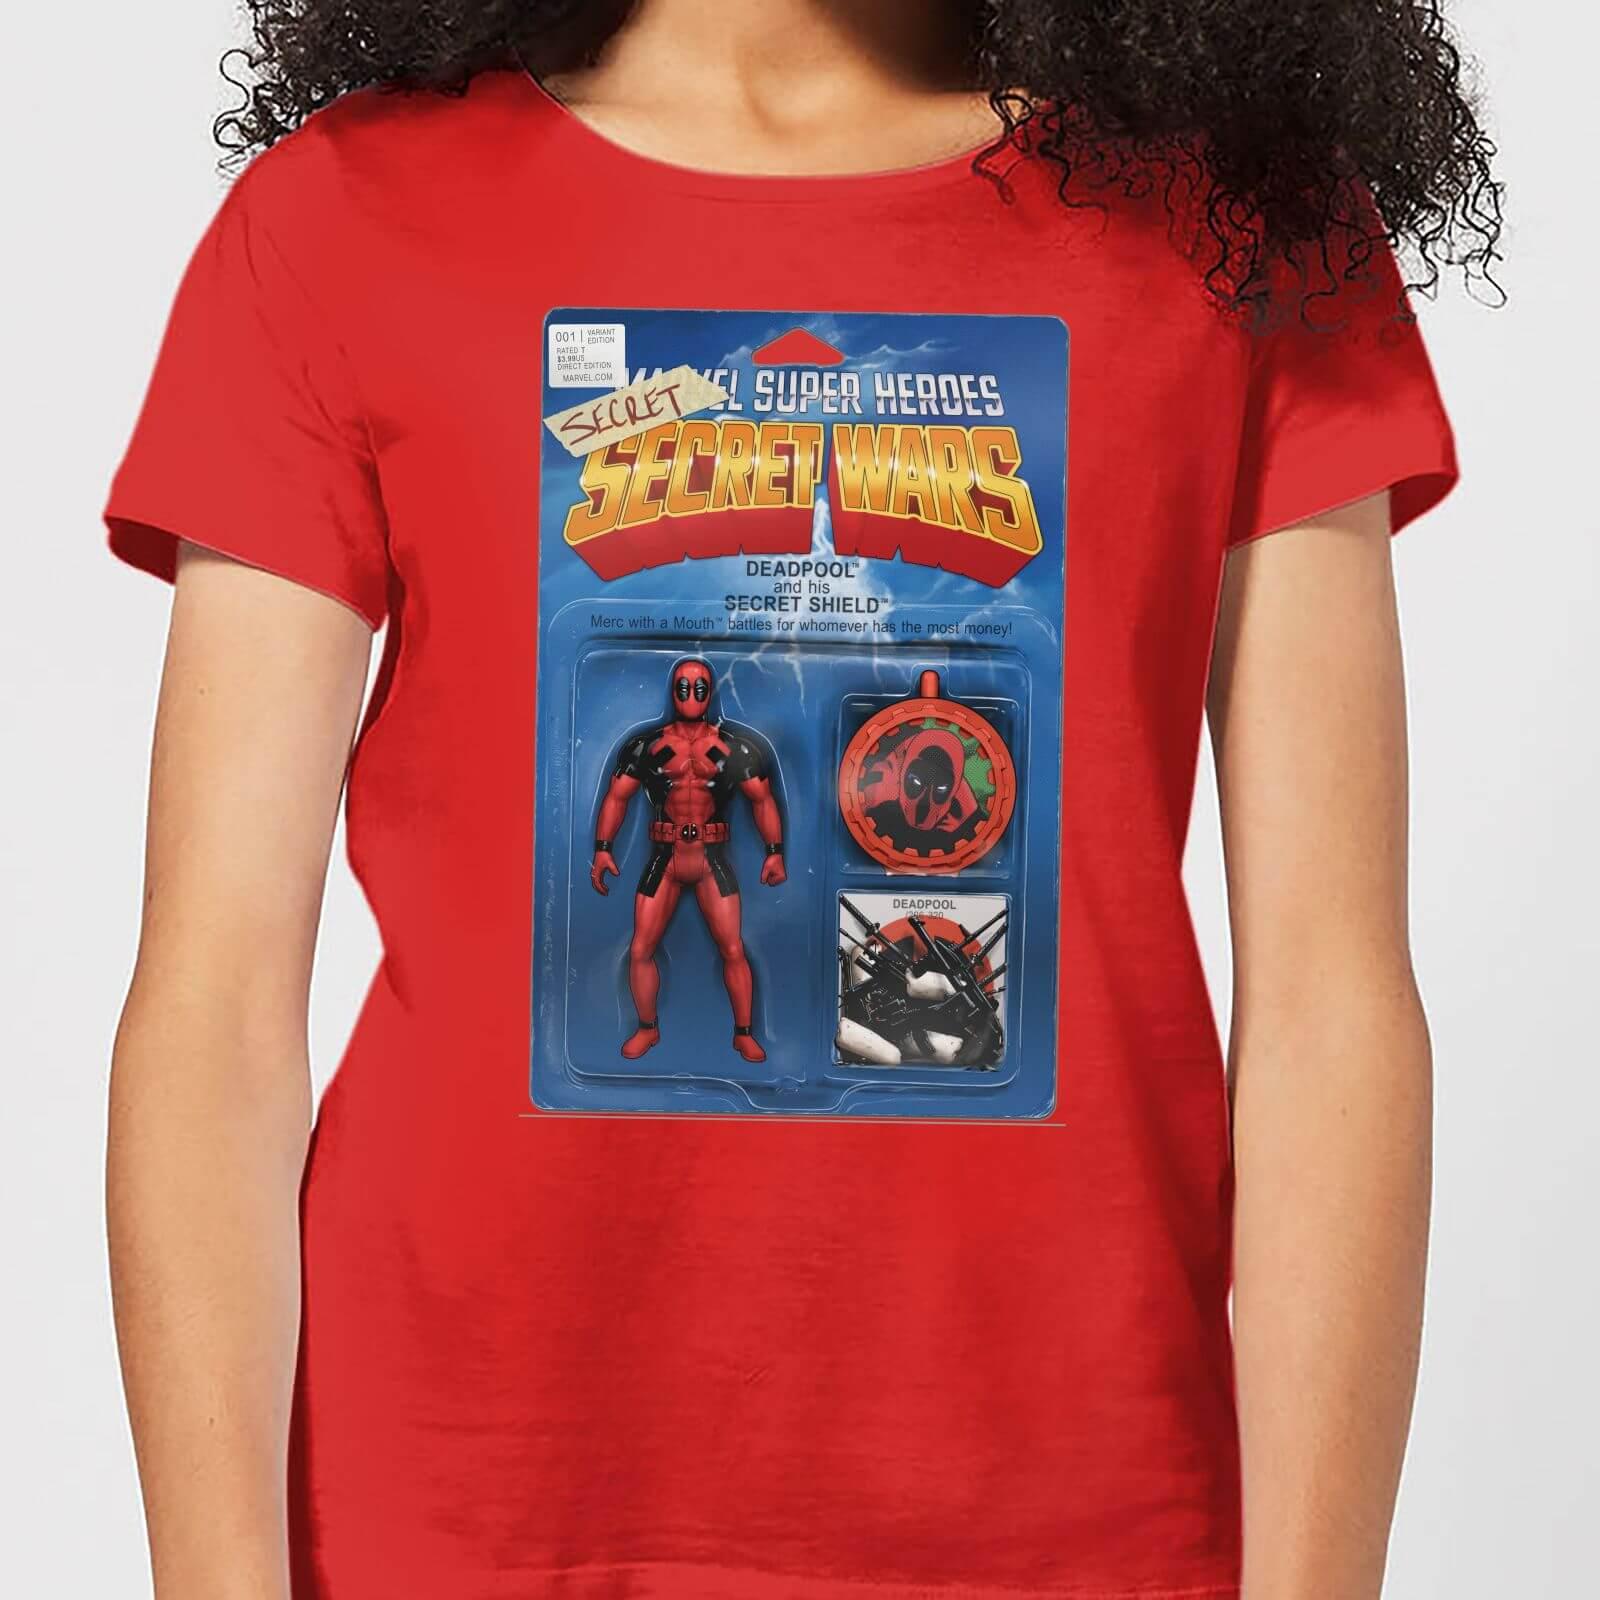 OfferteWeb.click 10-t-shirt-marvel-deadpool-secret-wars-action-figure-rosso